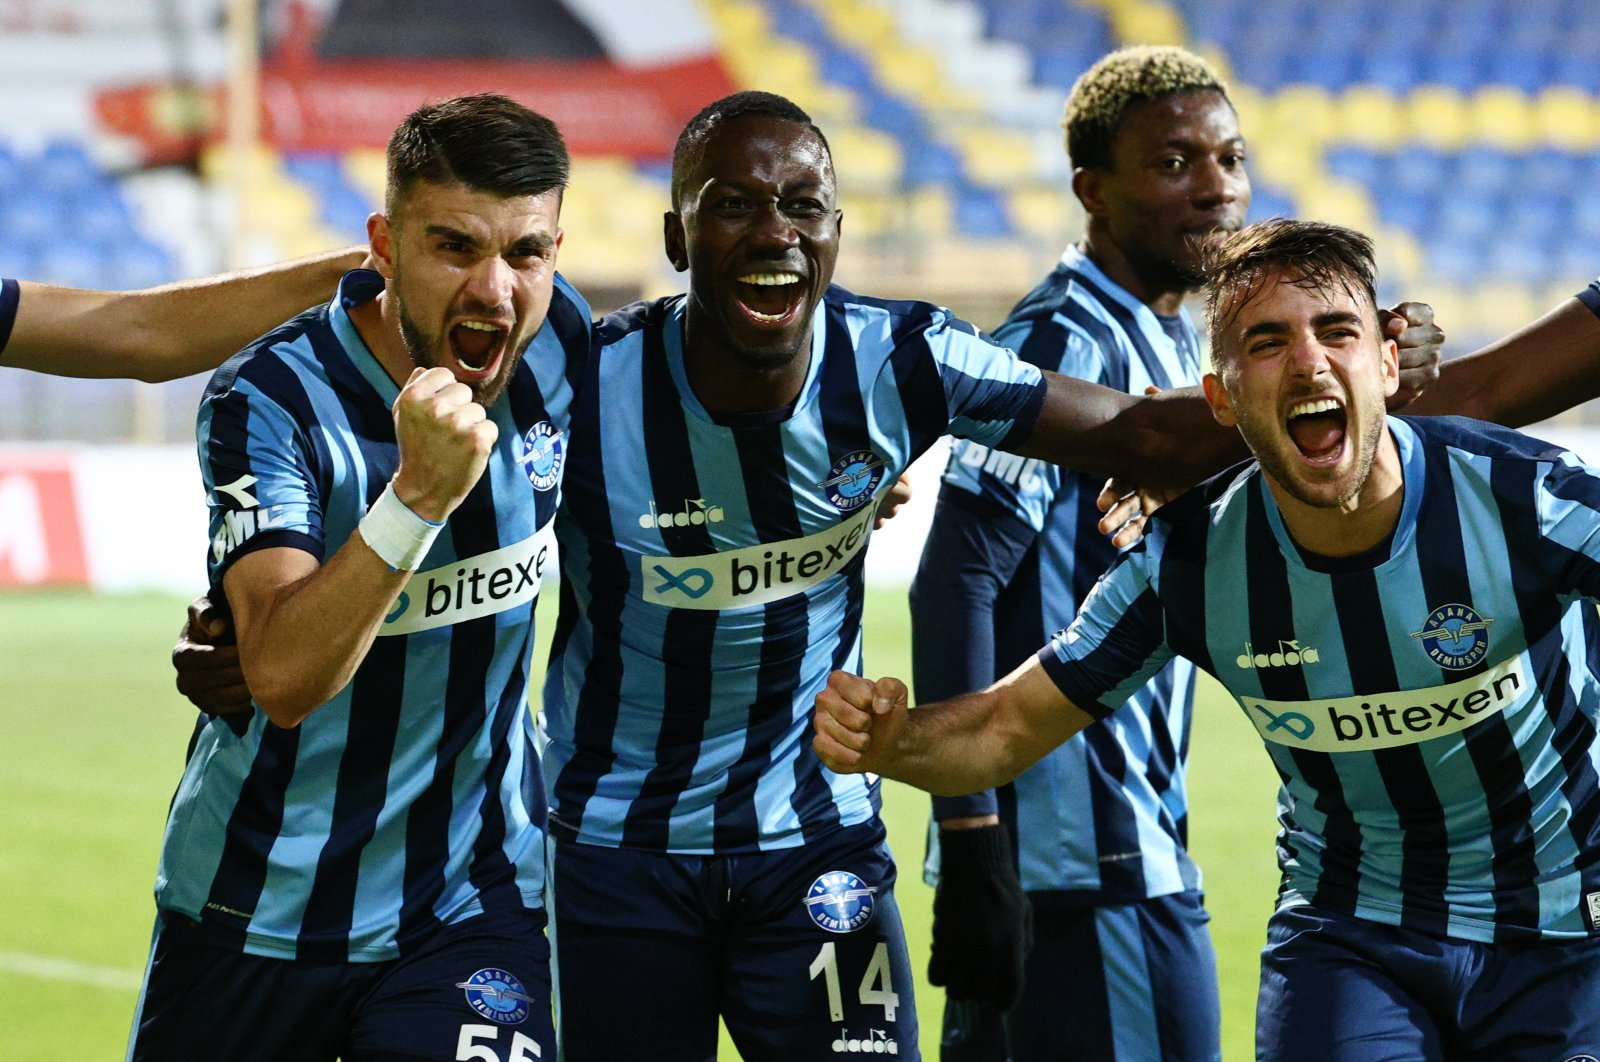 Adana Demirspor players celebrate a goal against Menemenspor at the Menemen İlçe Stadium, Izmir, Turkey, May 9, 2021.